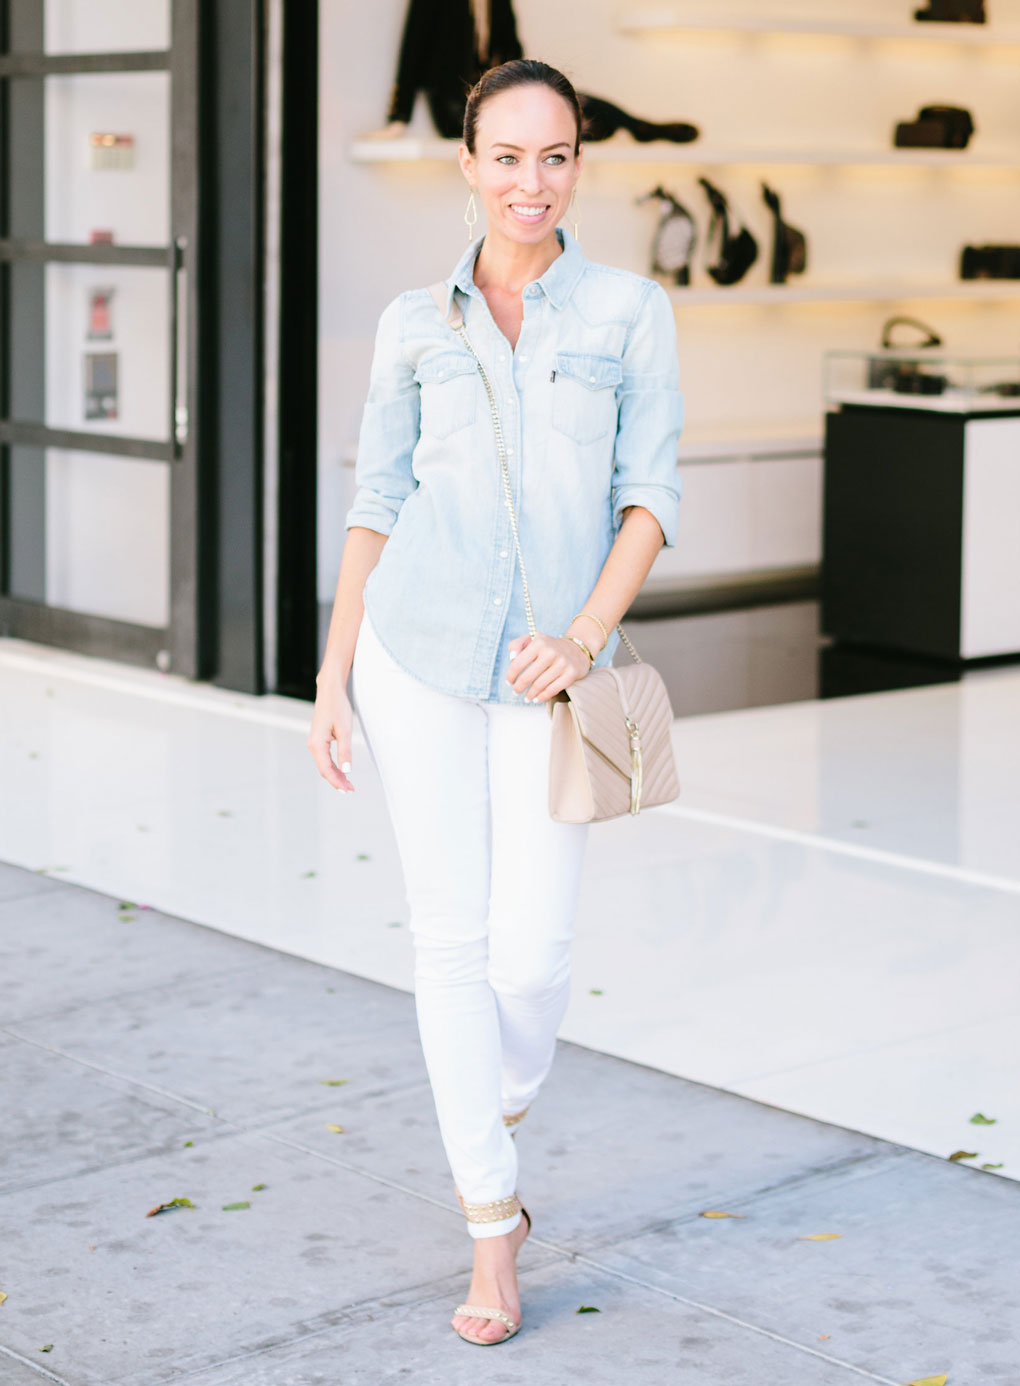 89cfa650e2 Sydne-Style-how-to-wear-white-jeans-in-